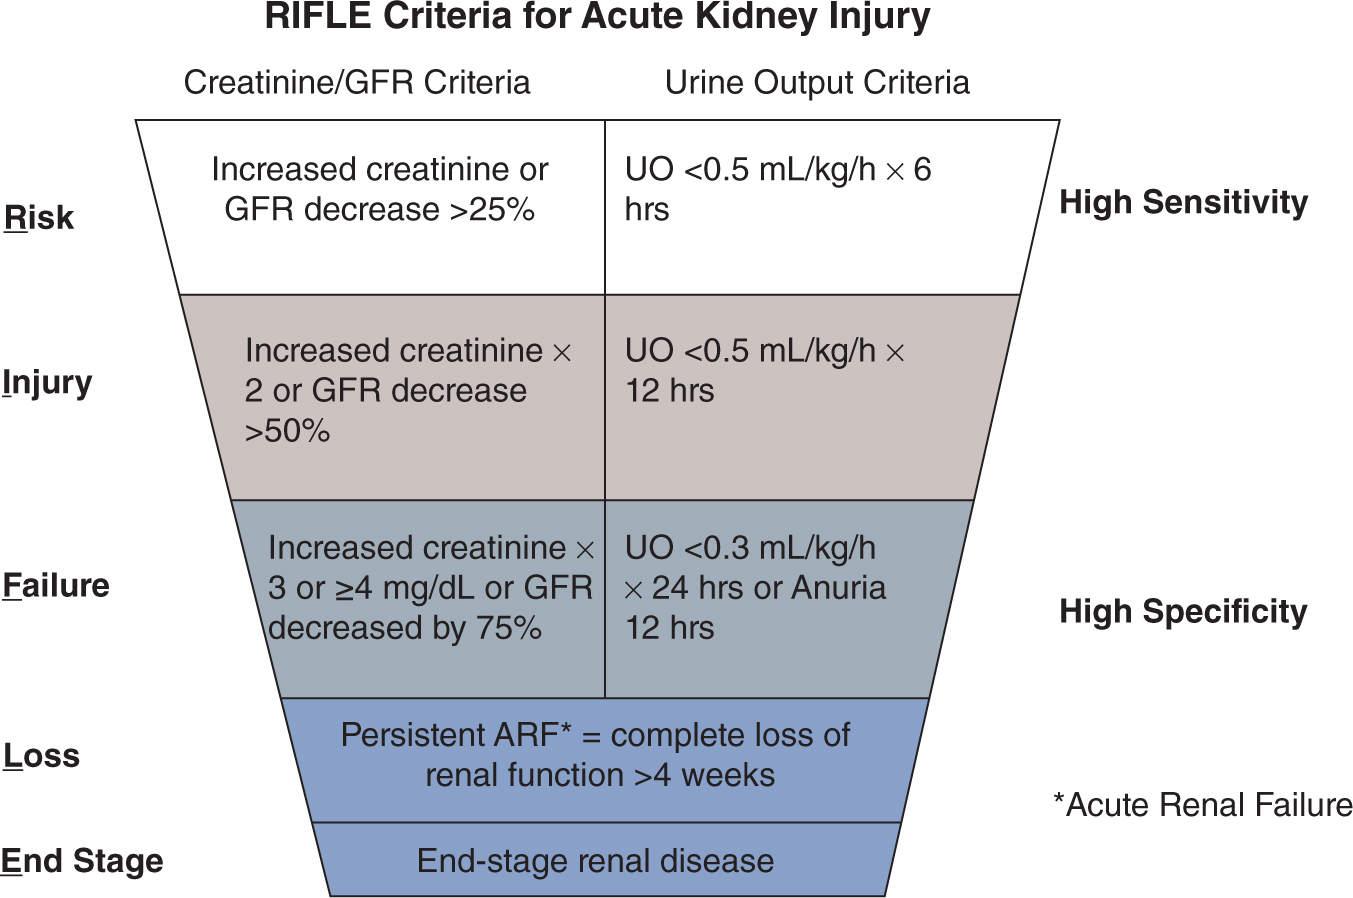 rifle criteria for aki pdf